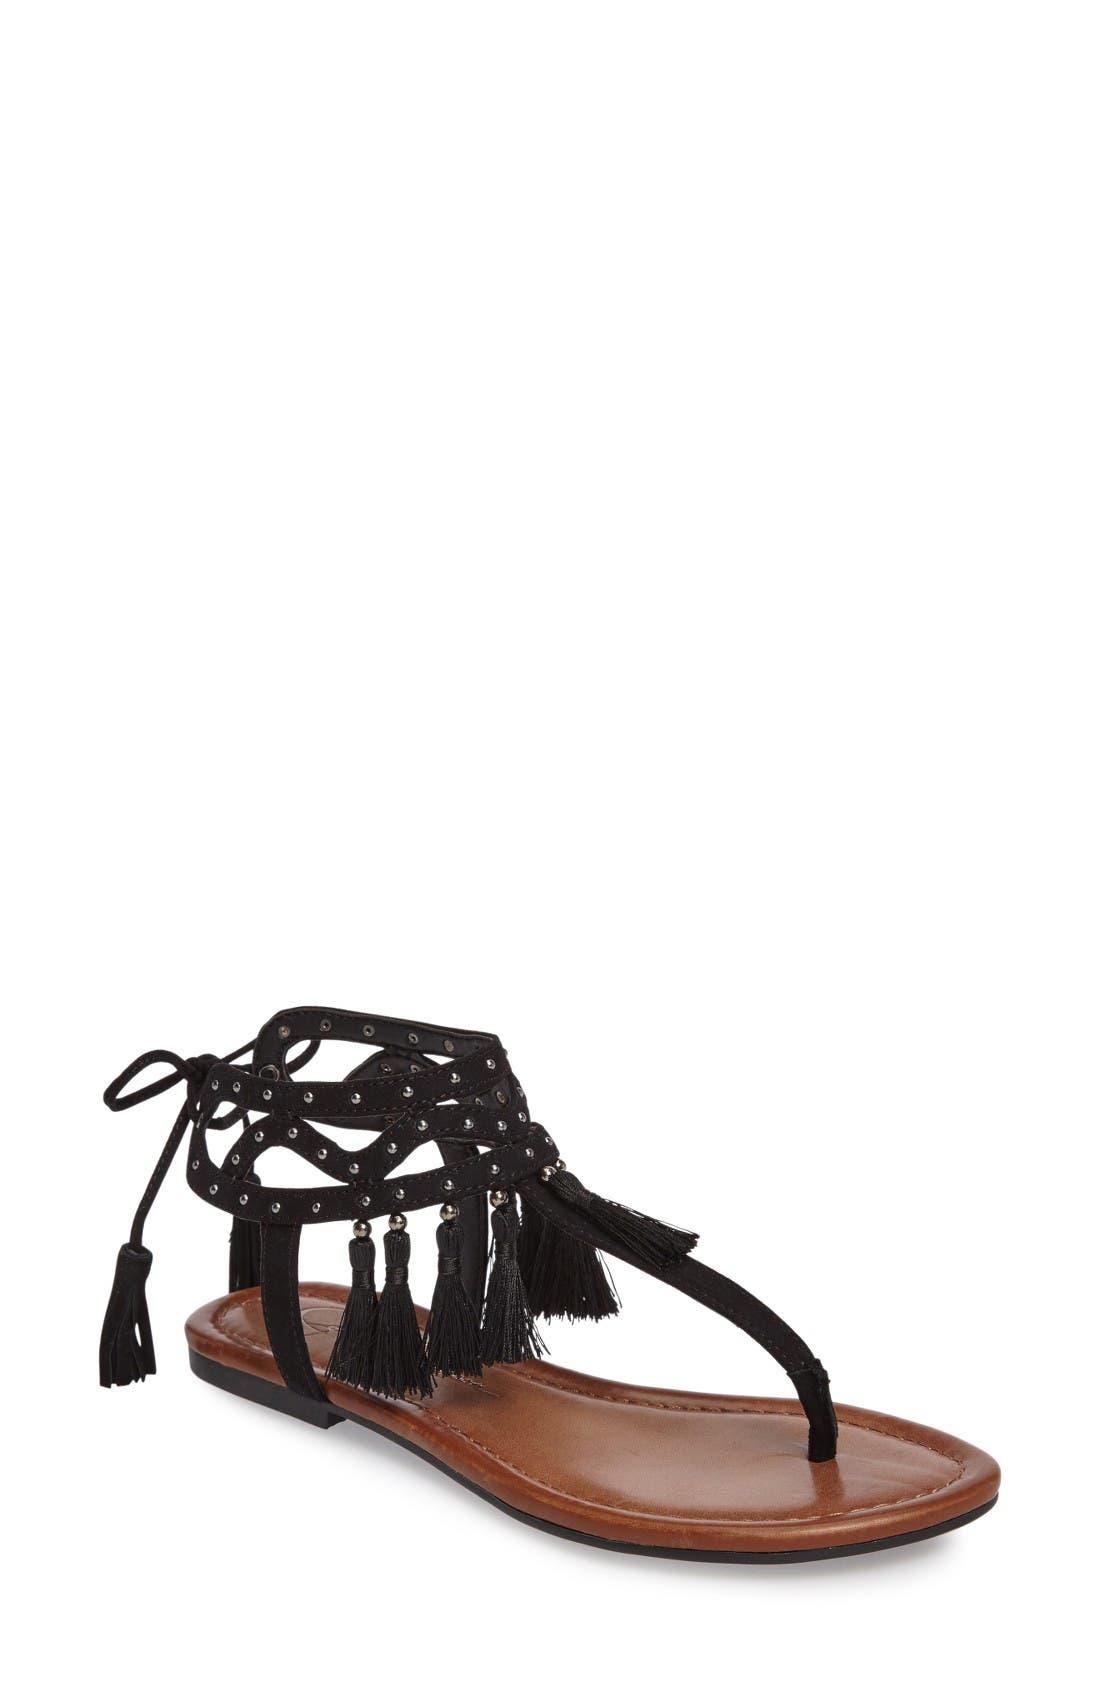 Alternate Image 1 Selected - Jessica Simpson Kamel Studded Tassel Sandal (Women)